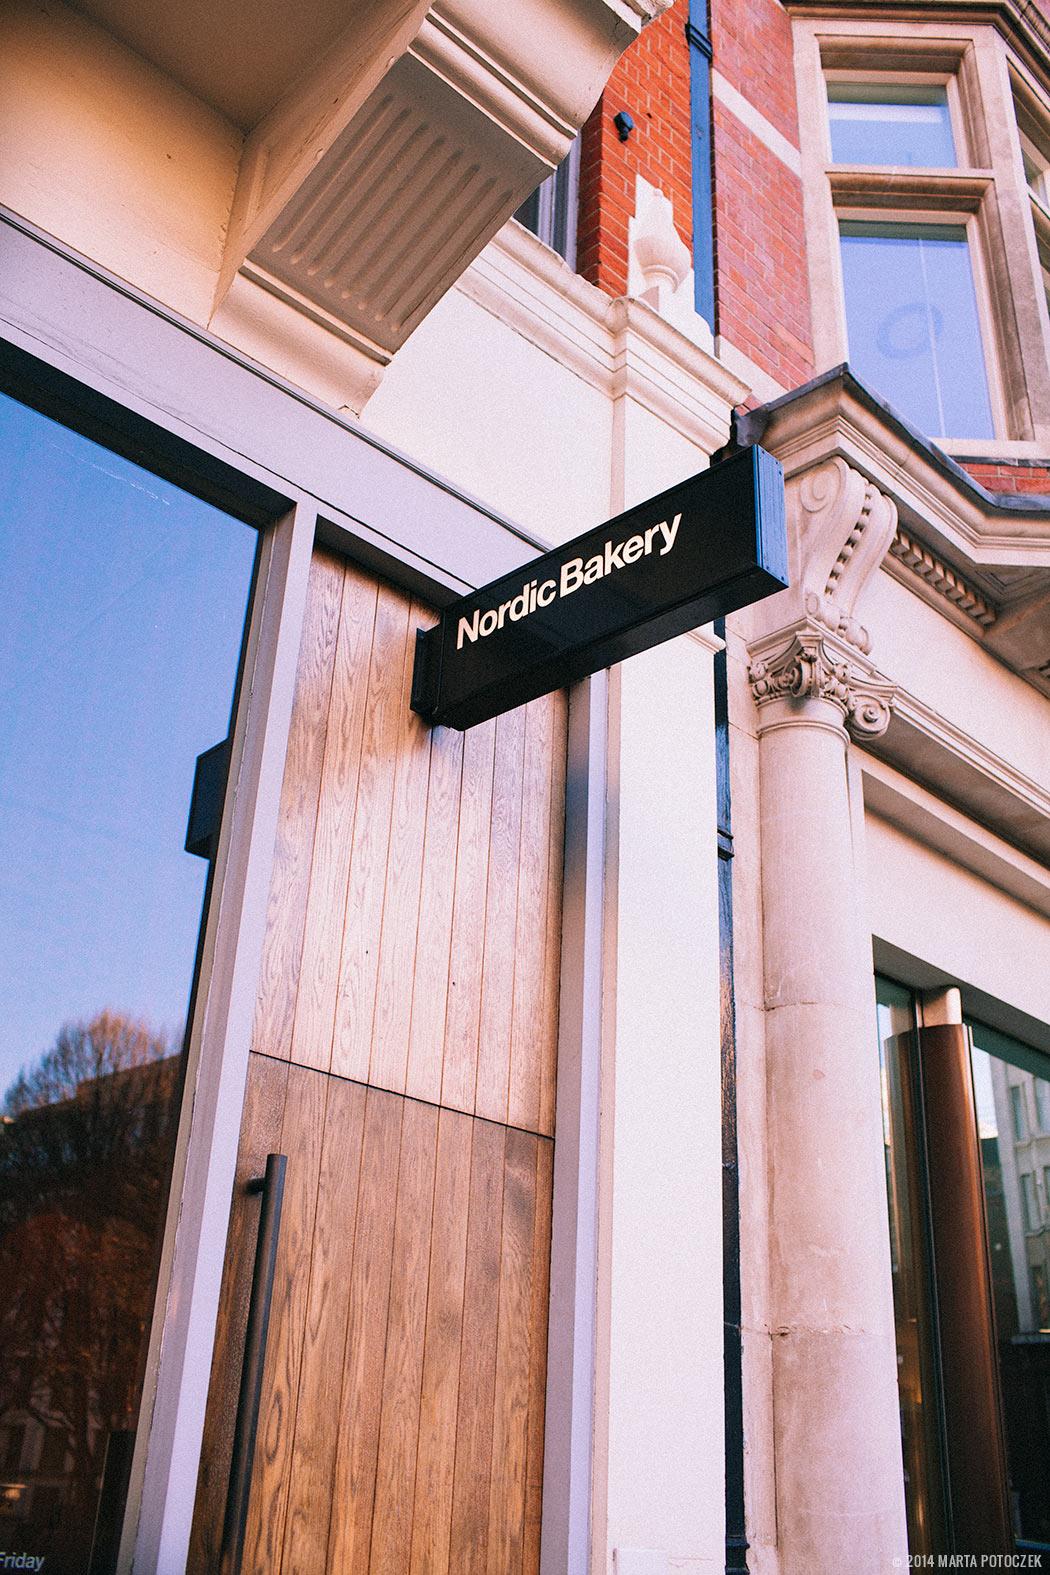 nordic_bakery_london_2